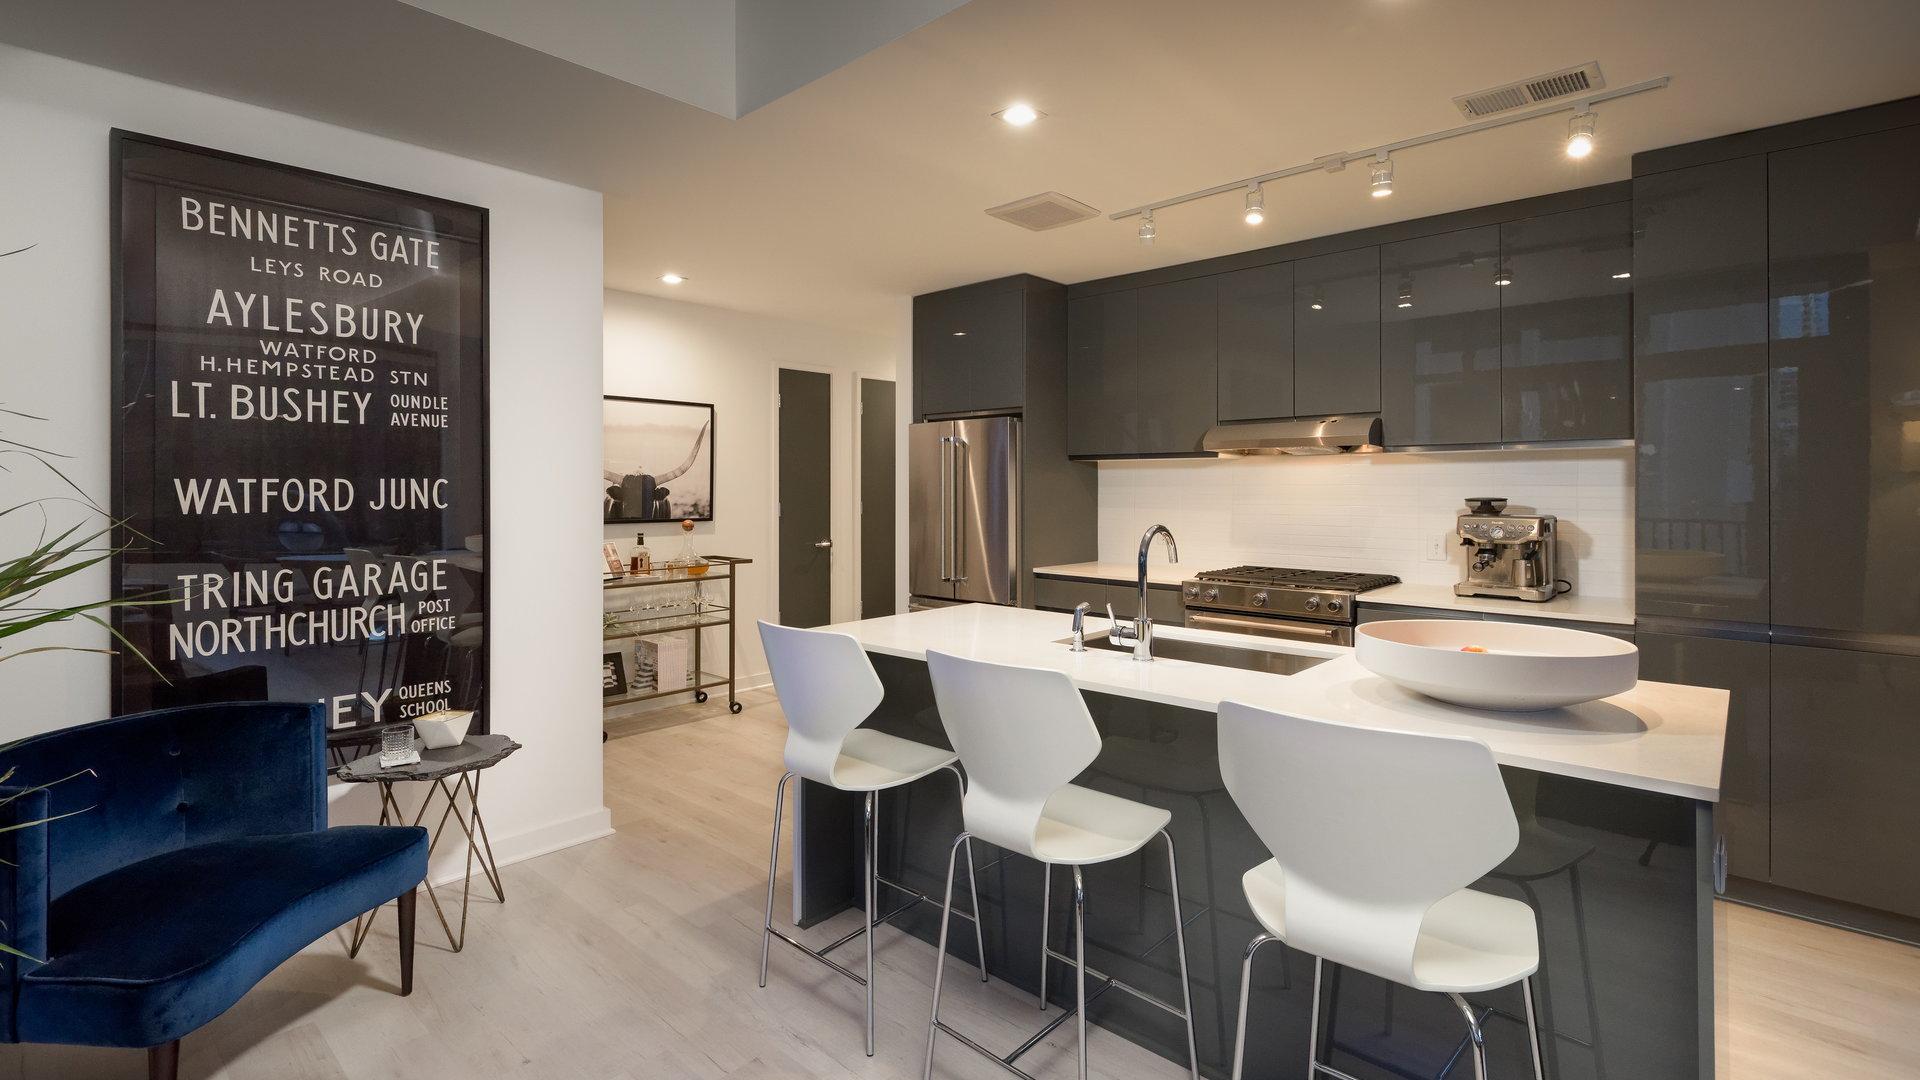 579 1 Bedroom Apartments for Rent under $4500 in Atlanta, GA